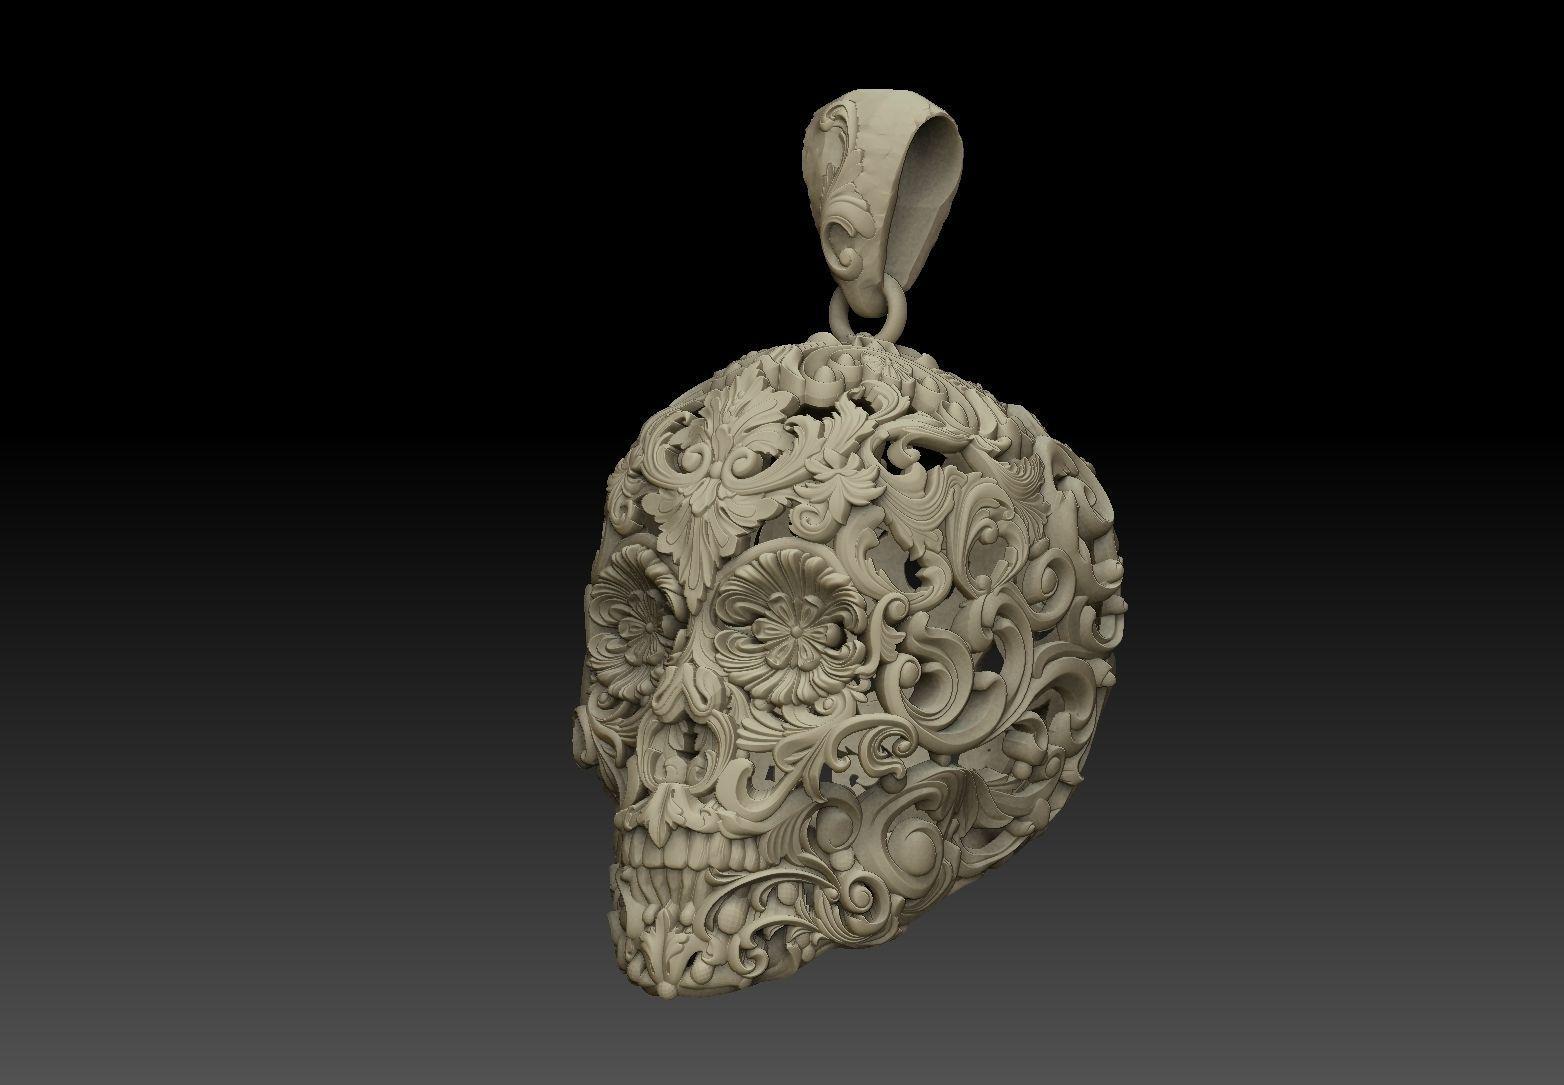 Skull ornamental  pendant jewelry